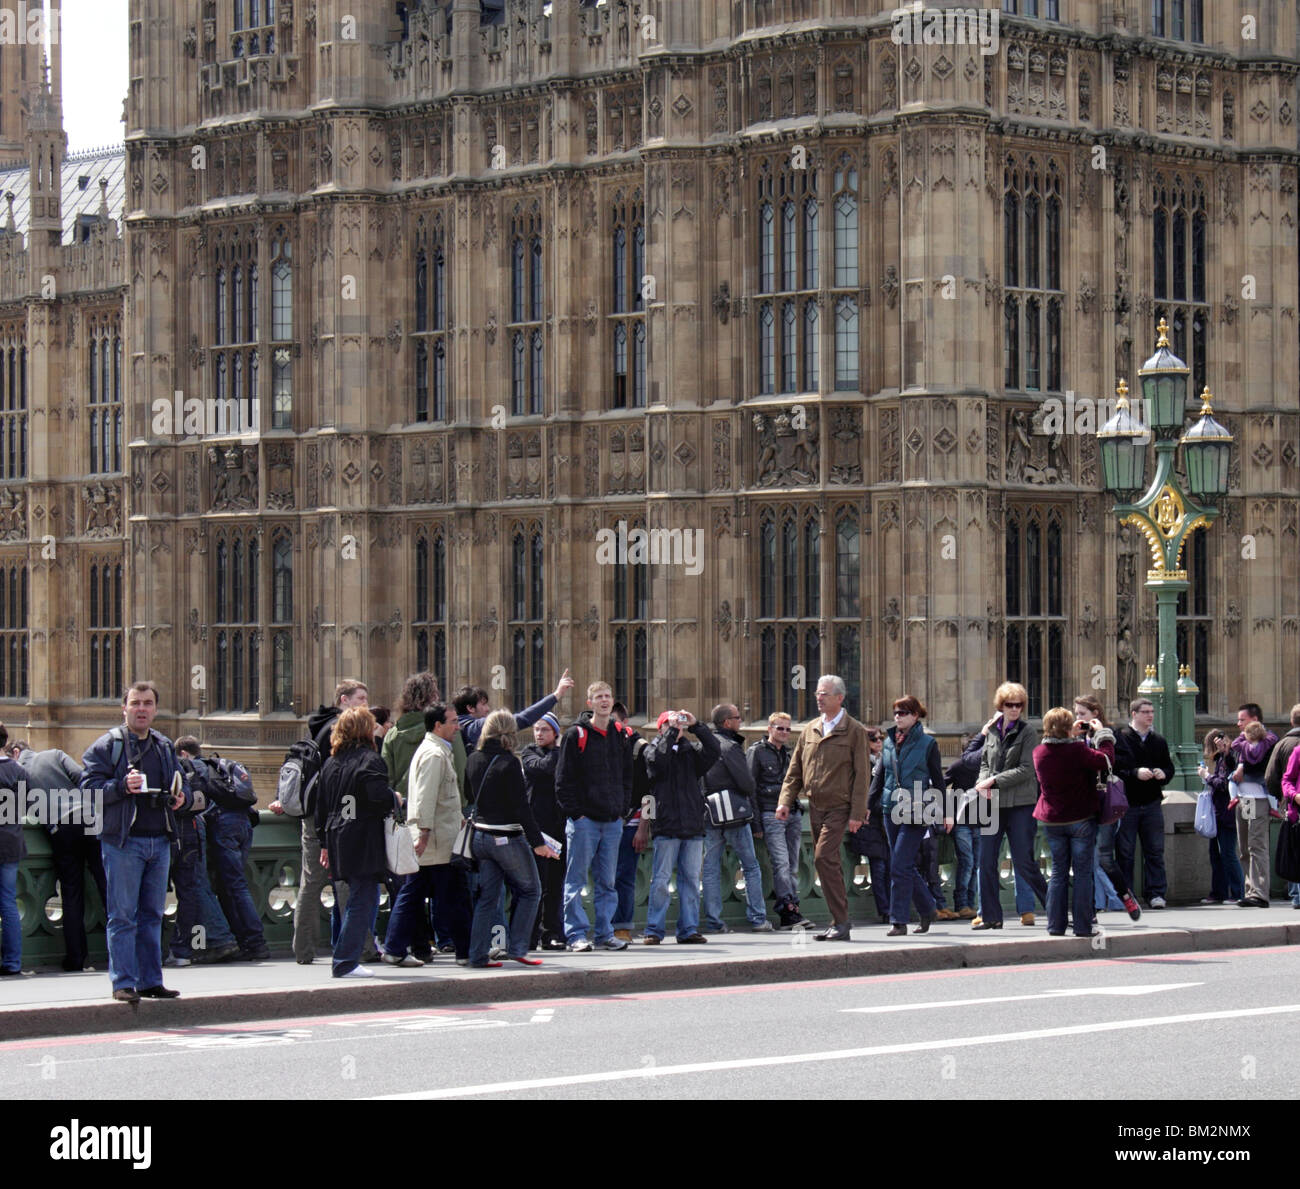 Tourists on Westminster Bridge London May 2010 Stock Photo